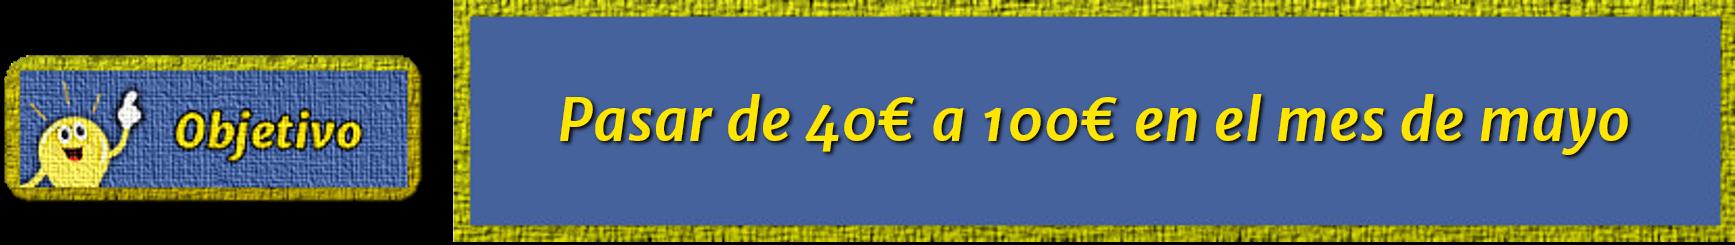 imagen-objetivo-reto-casino-40-100euros